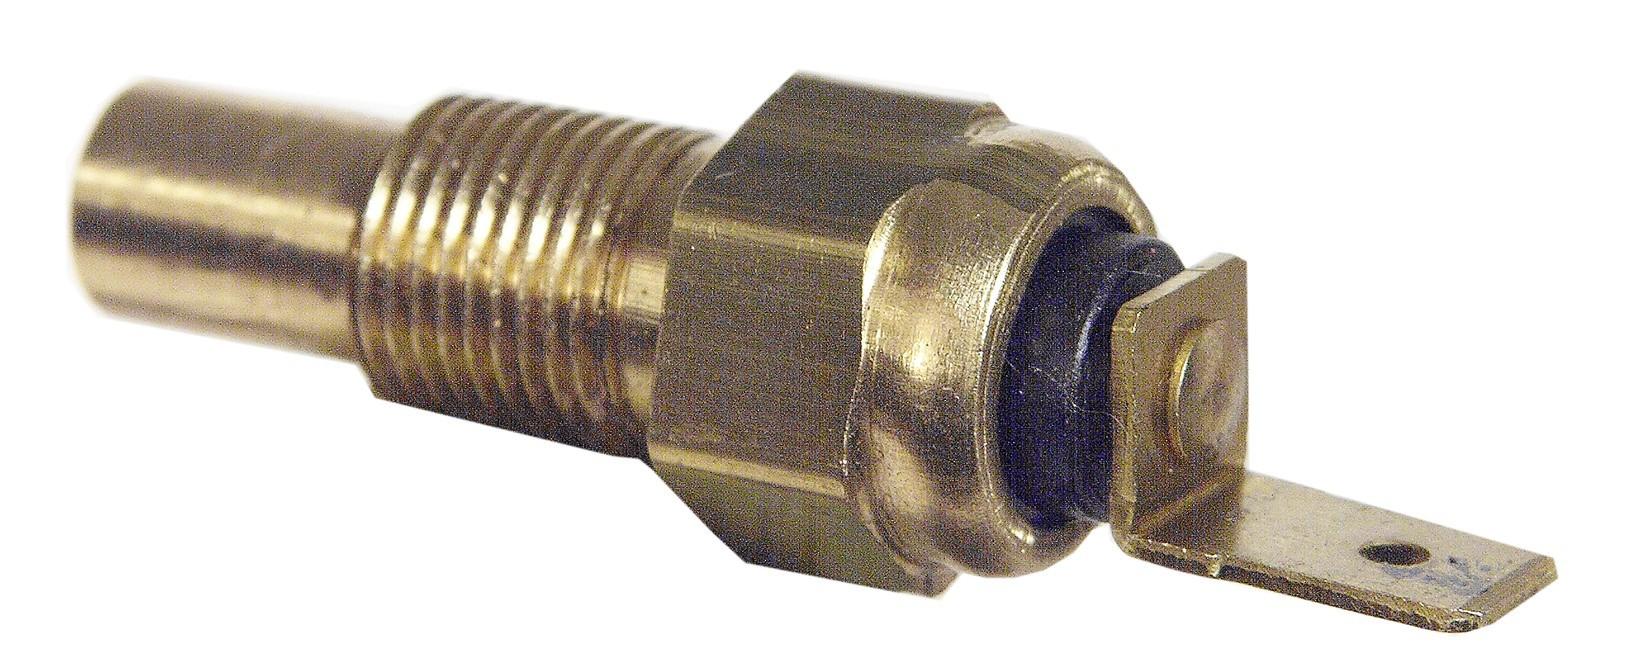 ADVAN-TECH - Engine Coolant Temperature Sender - ATW 7L2